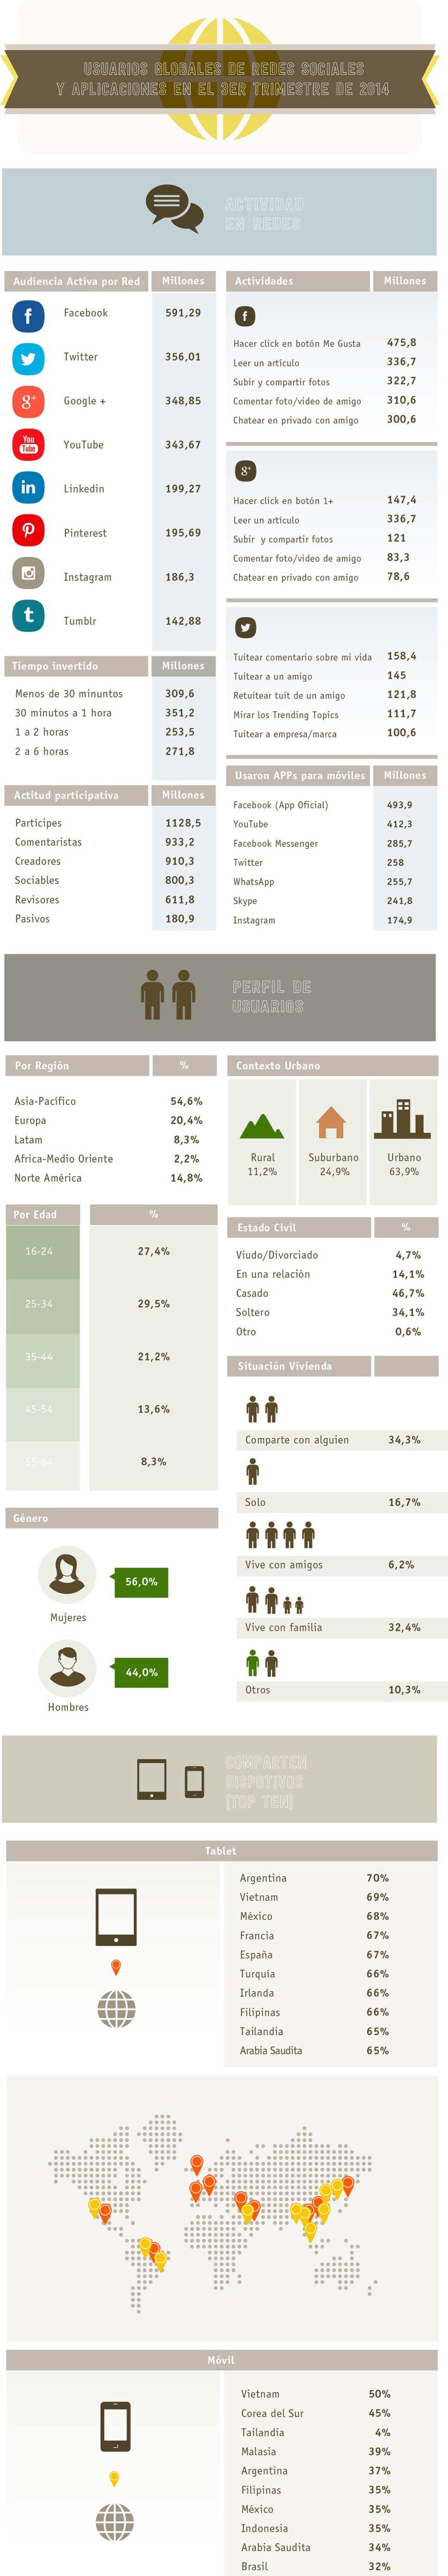 Audiencia global Redes Sociales (3T/2014)